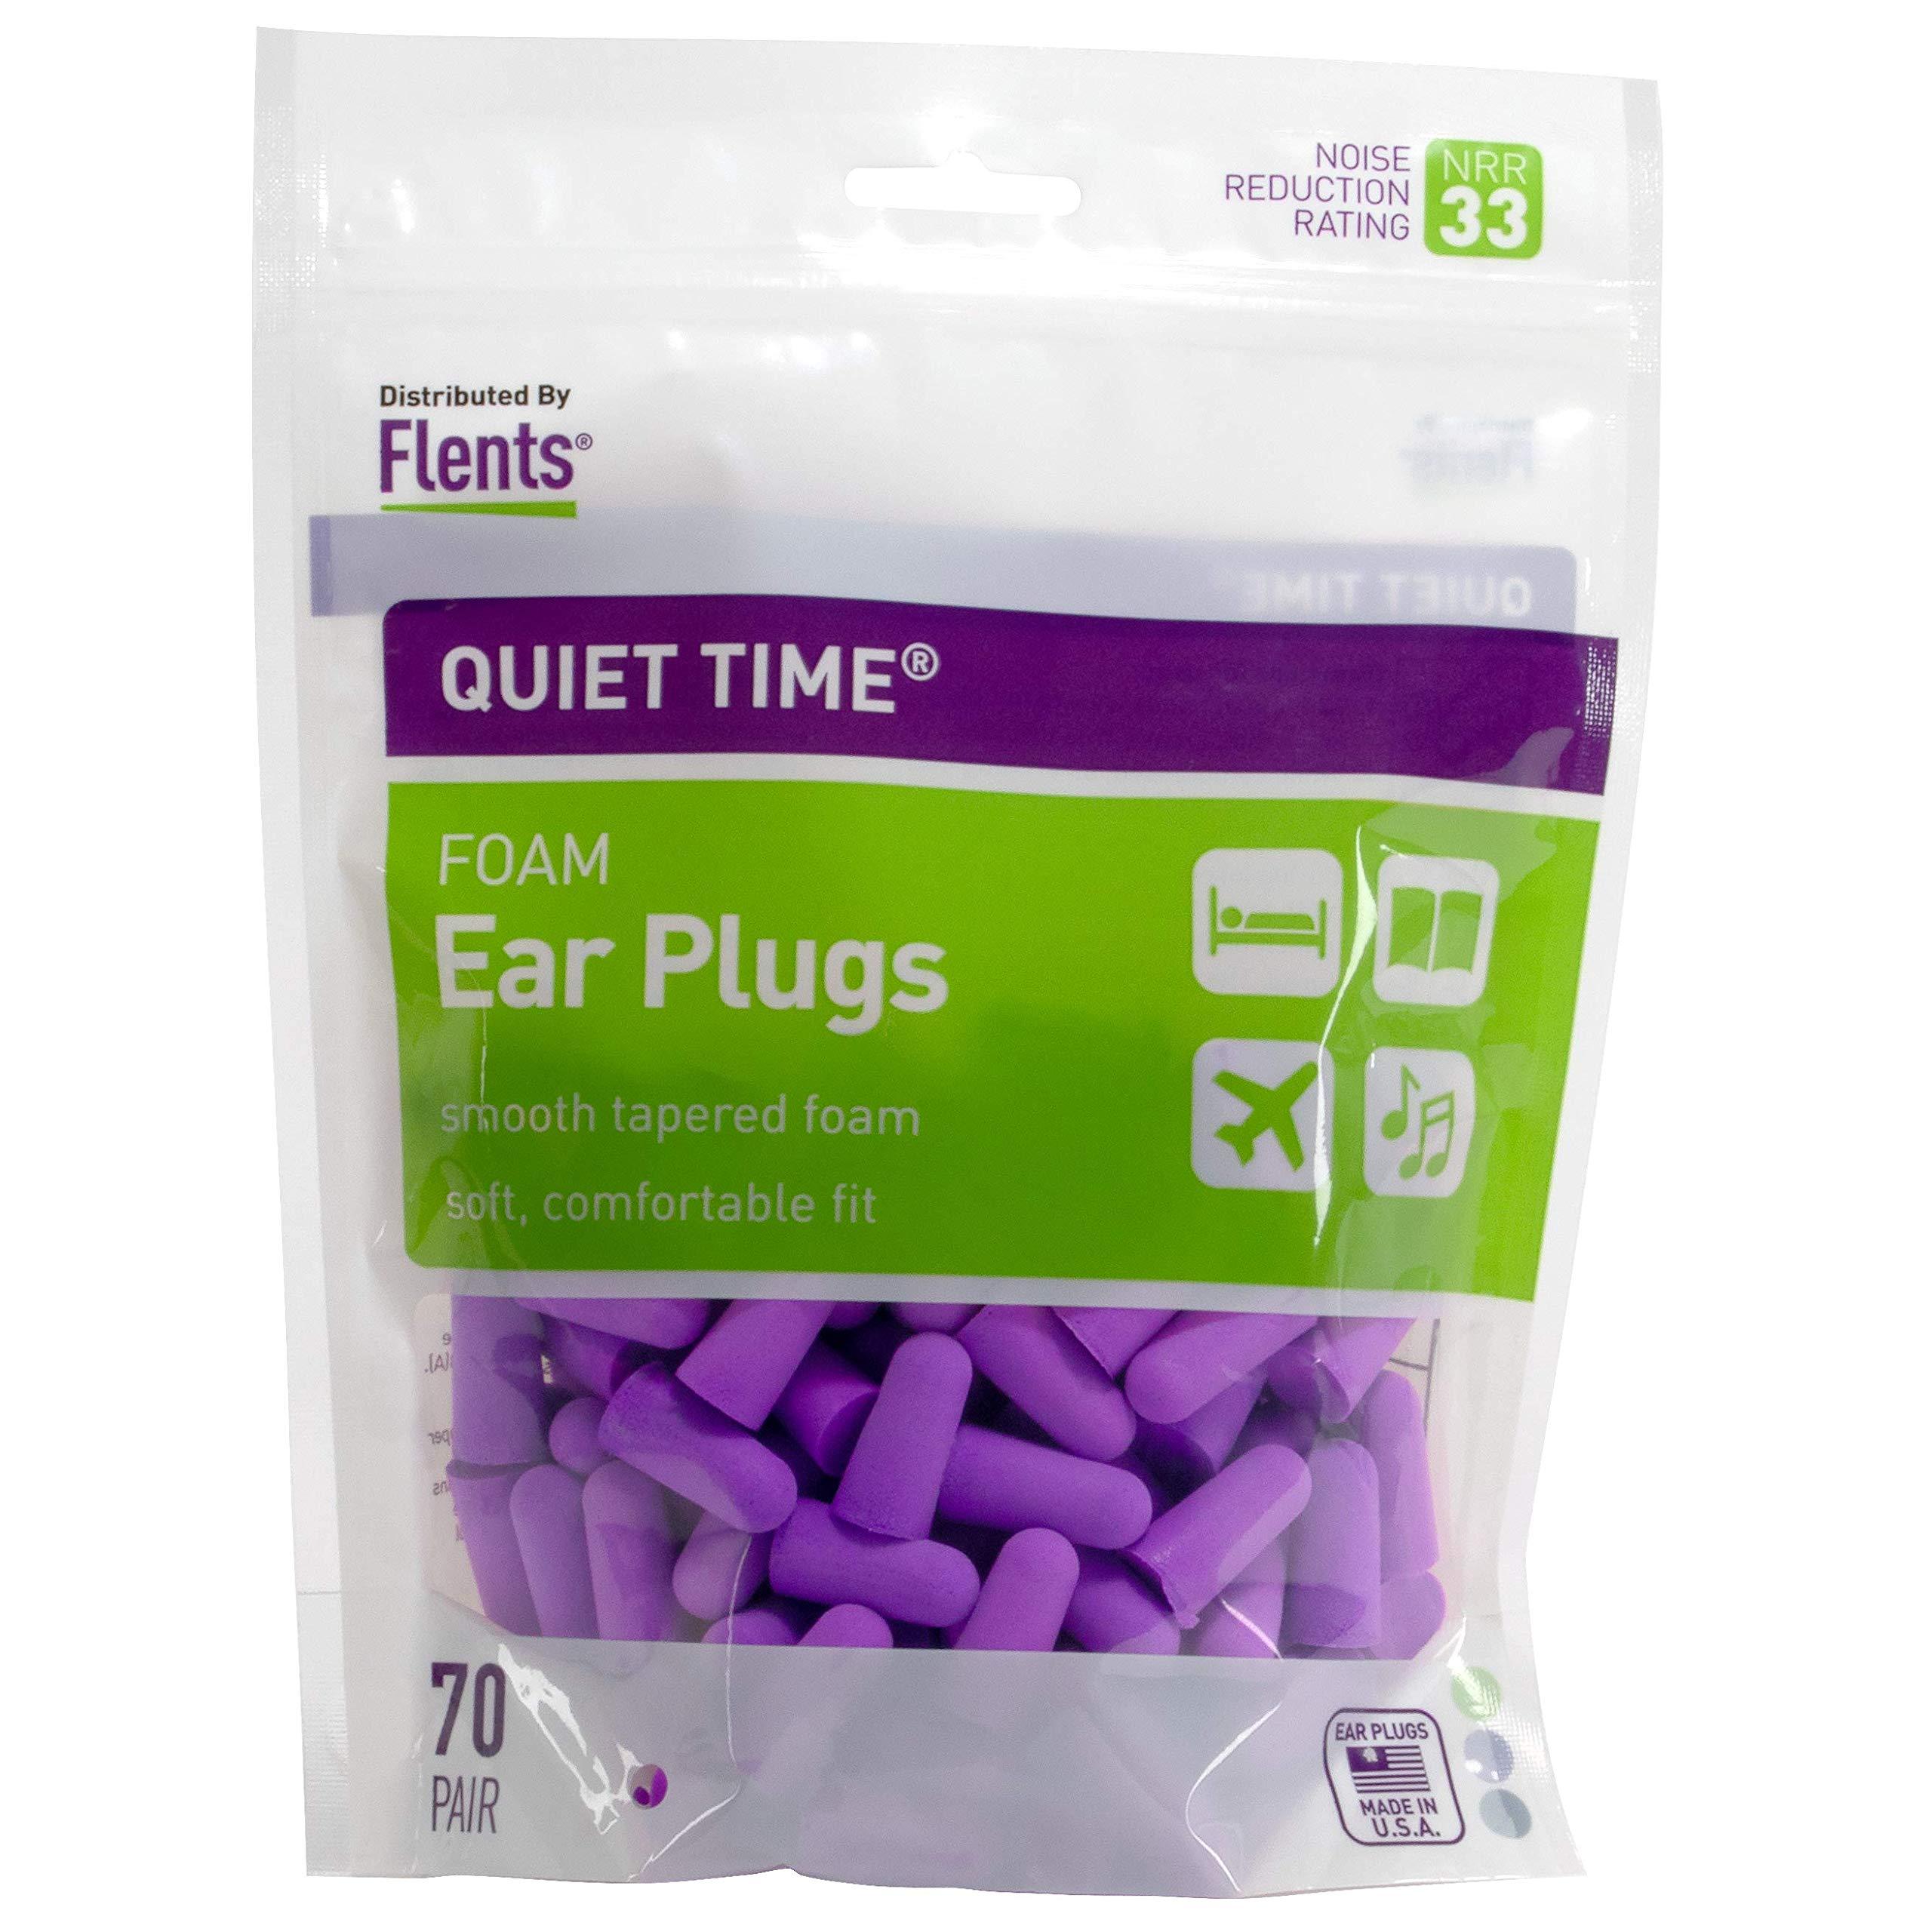 Flents Quiet Time Ear Plugs/Earplugs (70 Pair Bonus Pack) NRR 33 by Flents (Image #1)